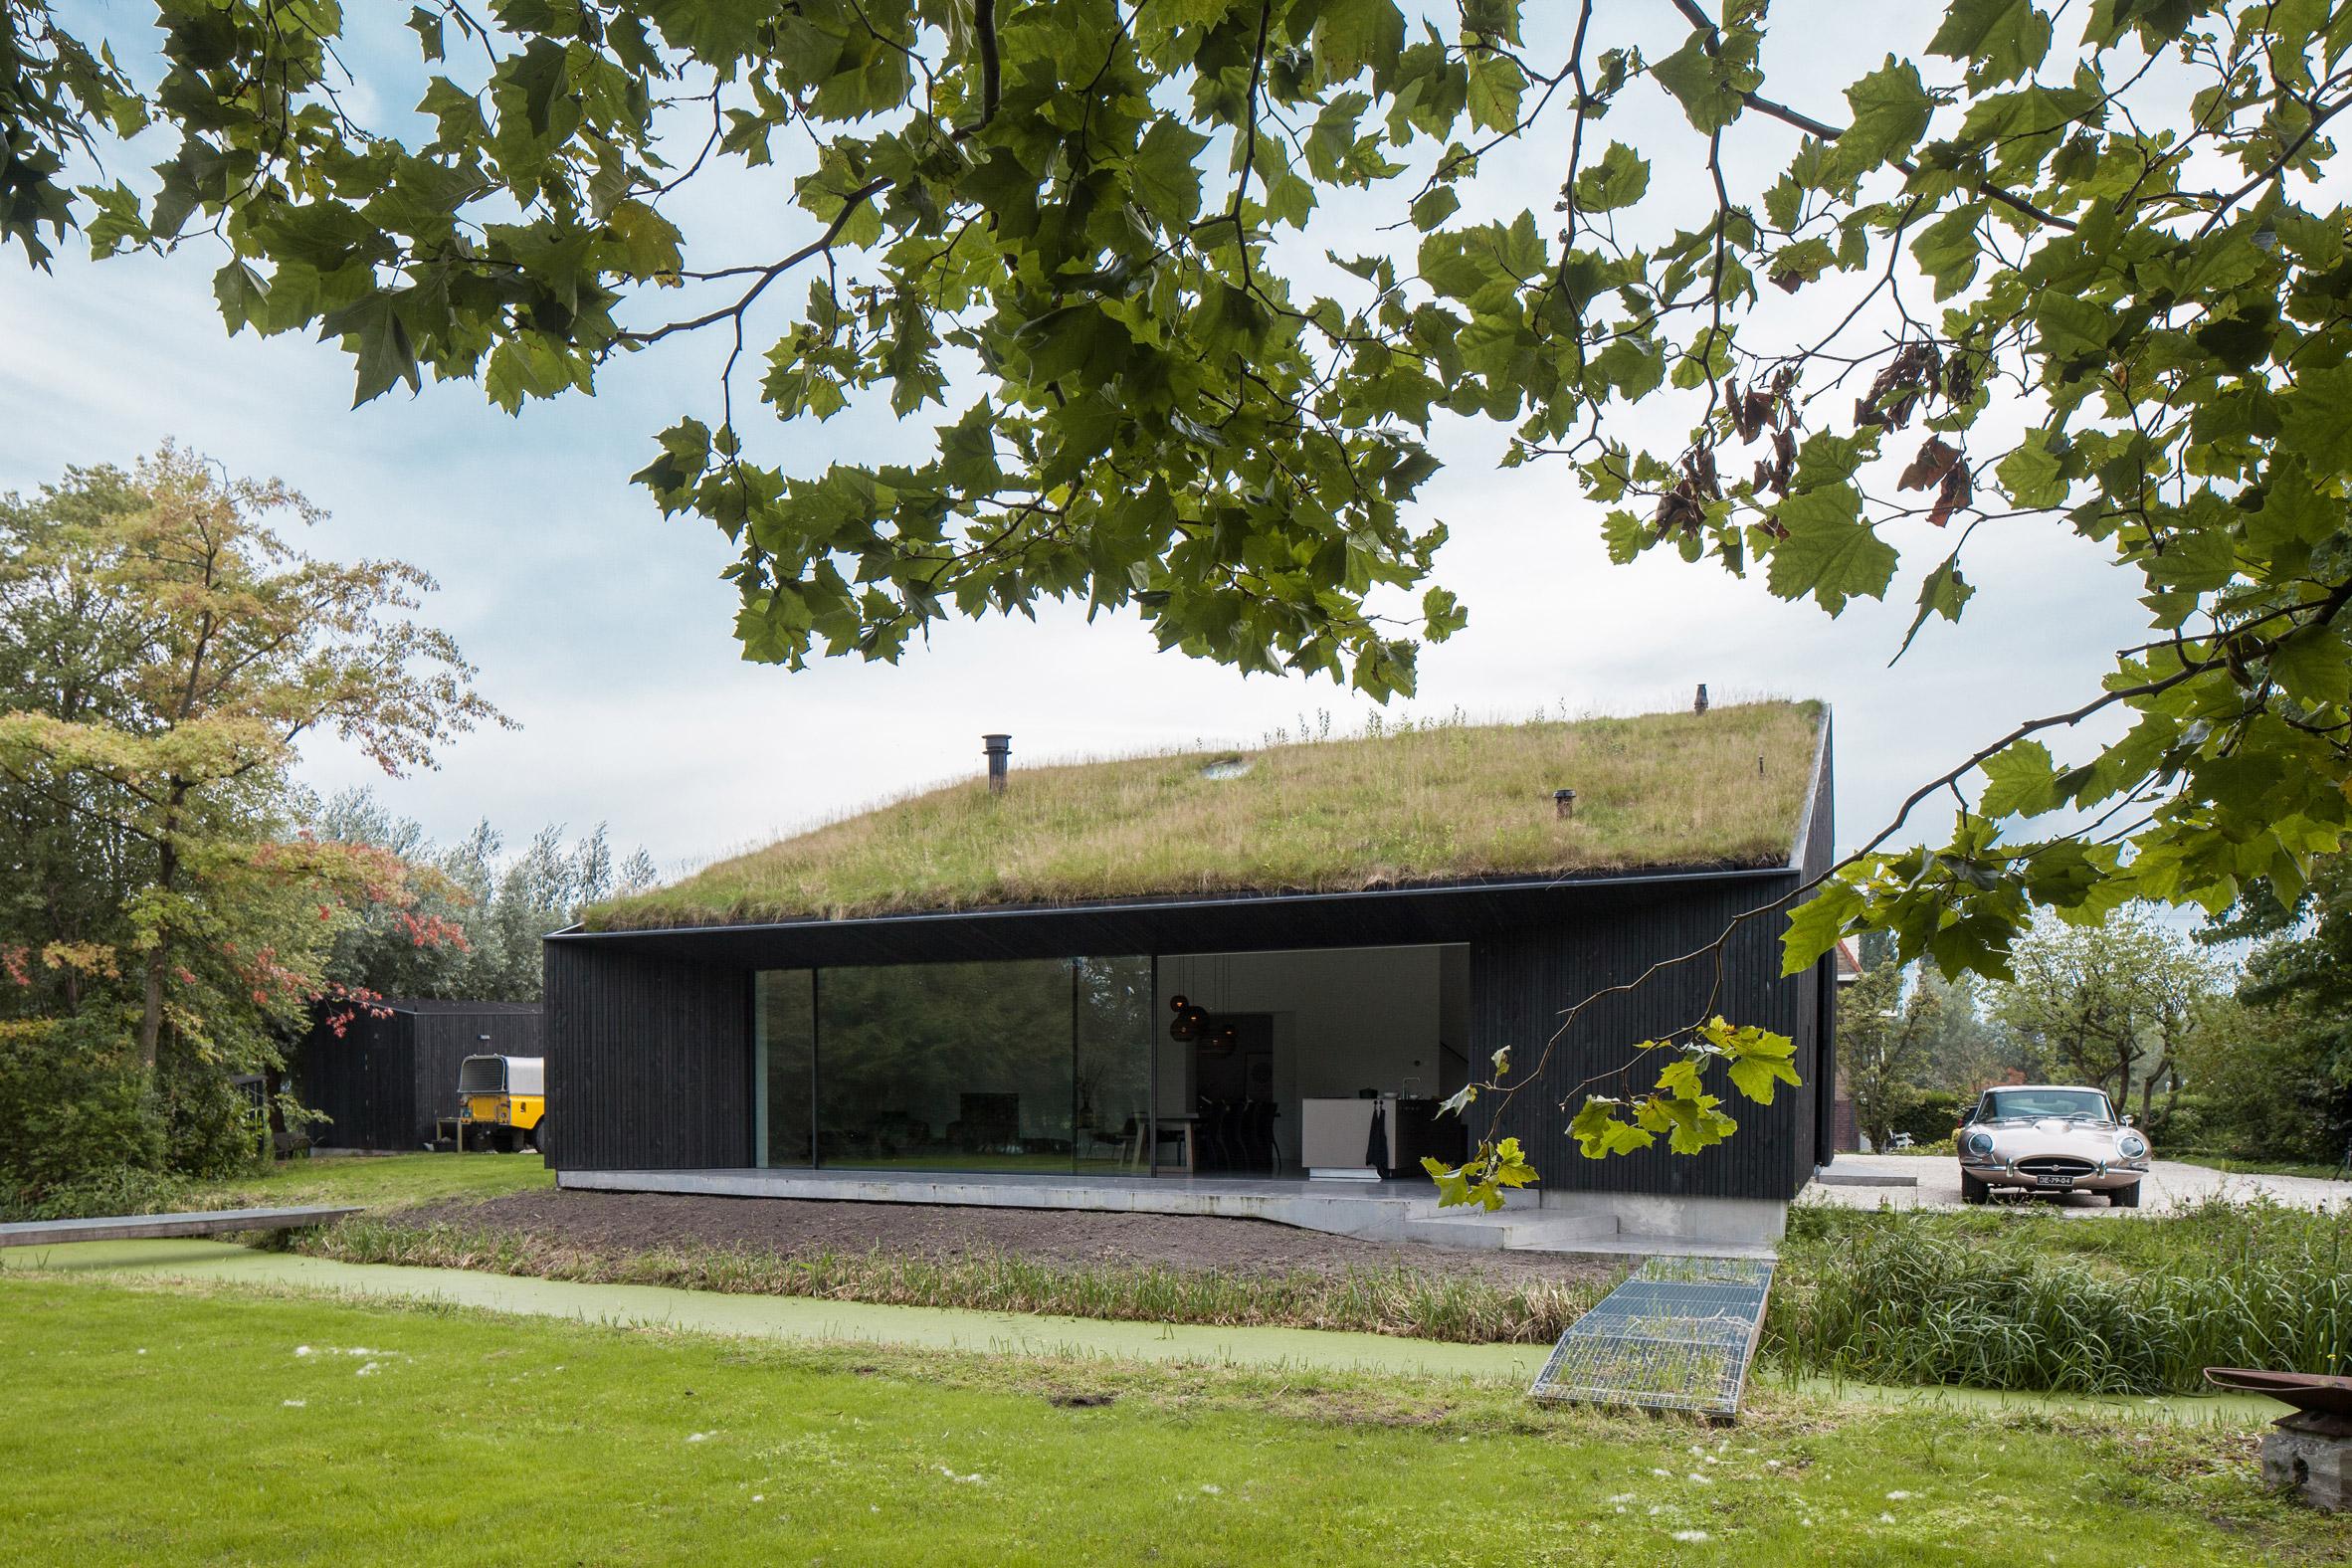 villa-SG21-fillieverhoeven-architects-residential-architecture_dezeen_2364_col_5